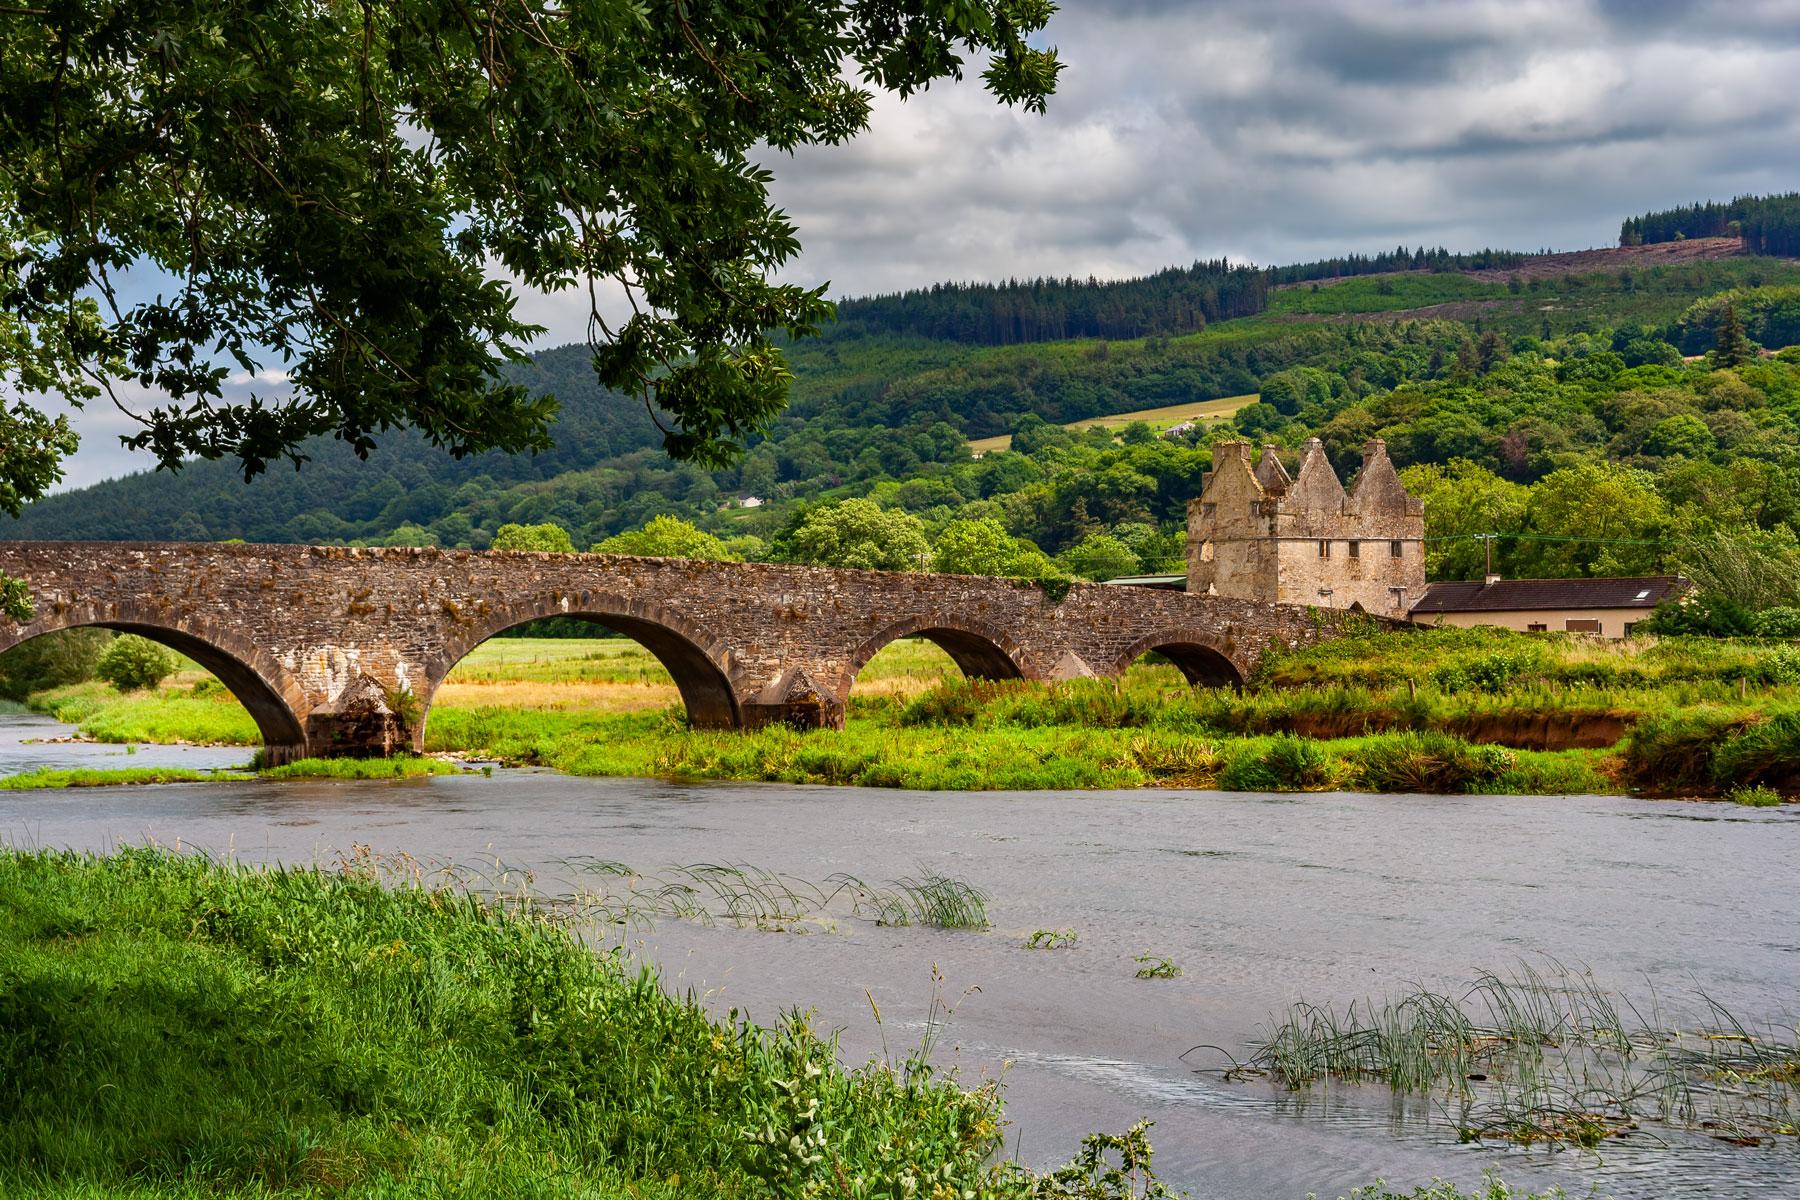 Bridge over the river Suir